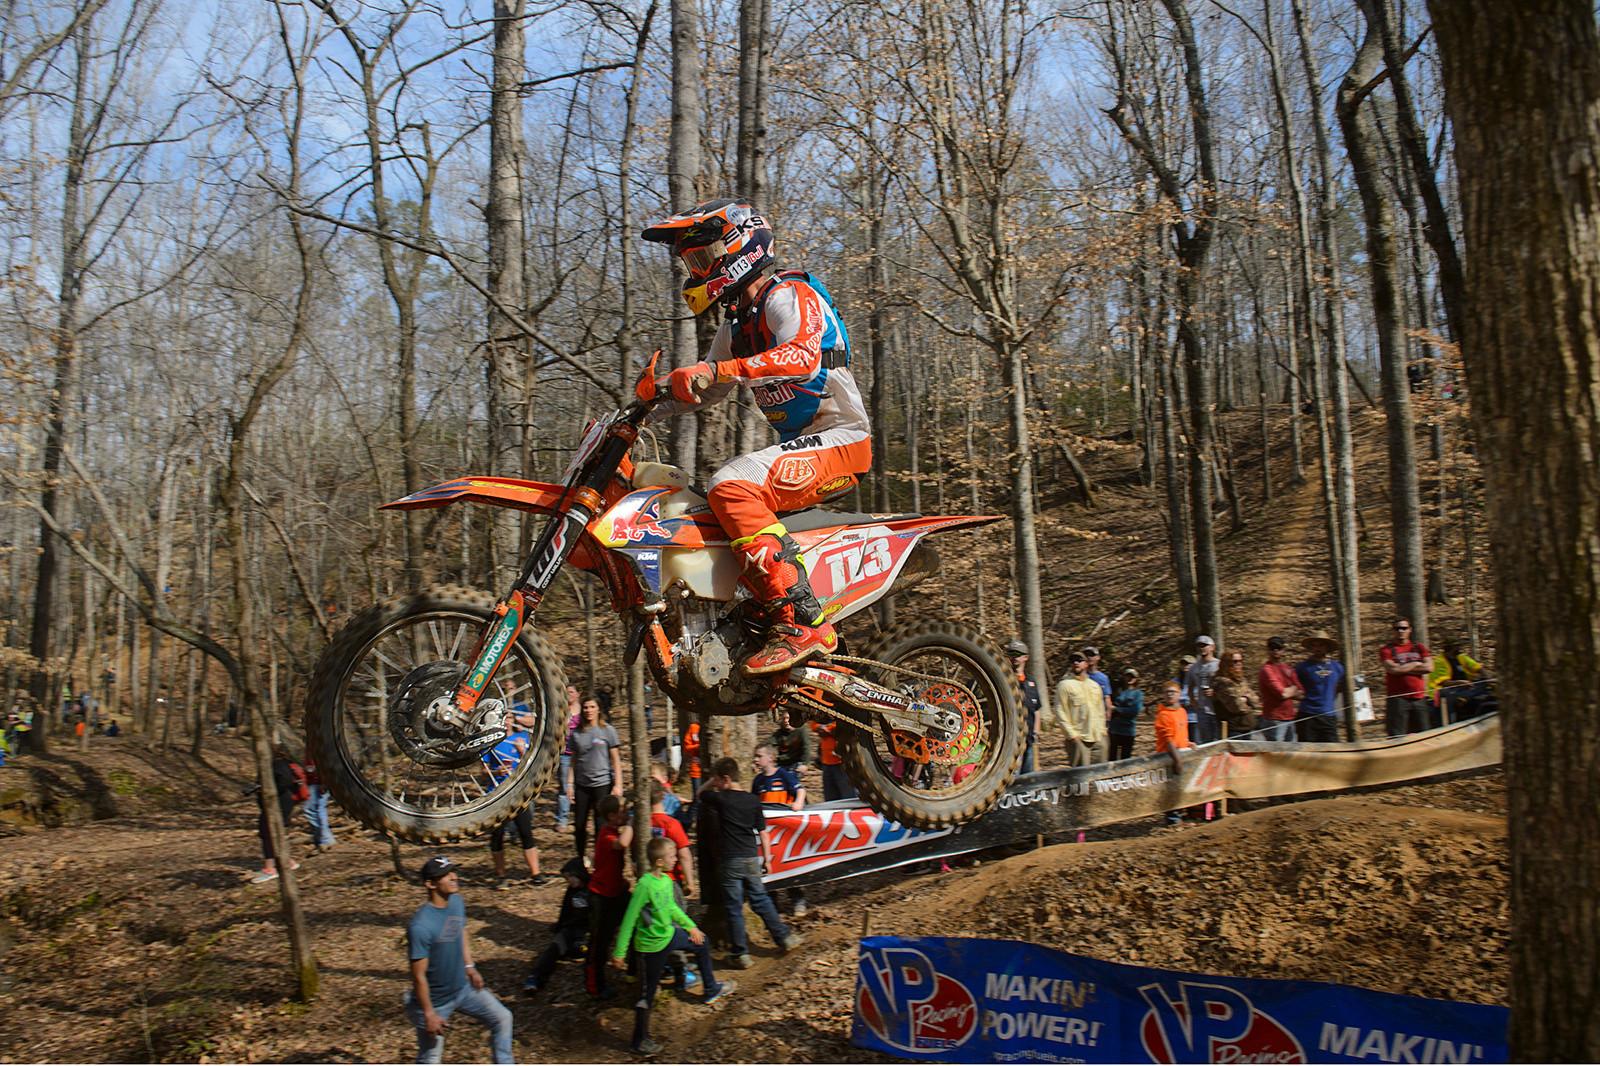 Russell Bobbitt - Big Buck GNCC - Motocross Pictures - Vital MX